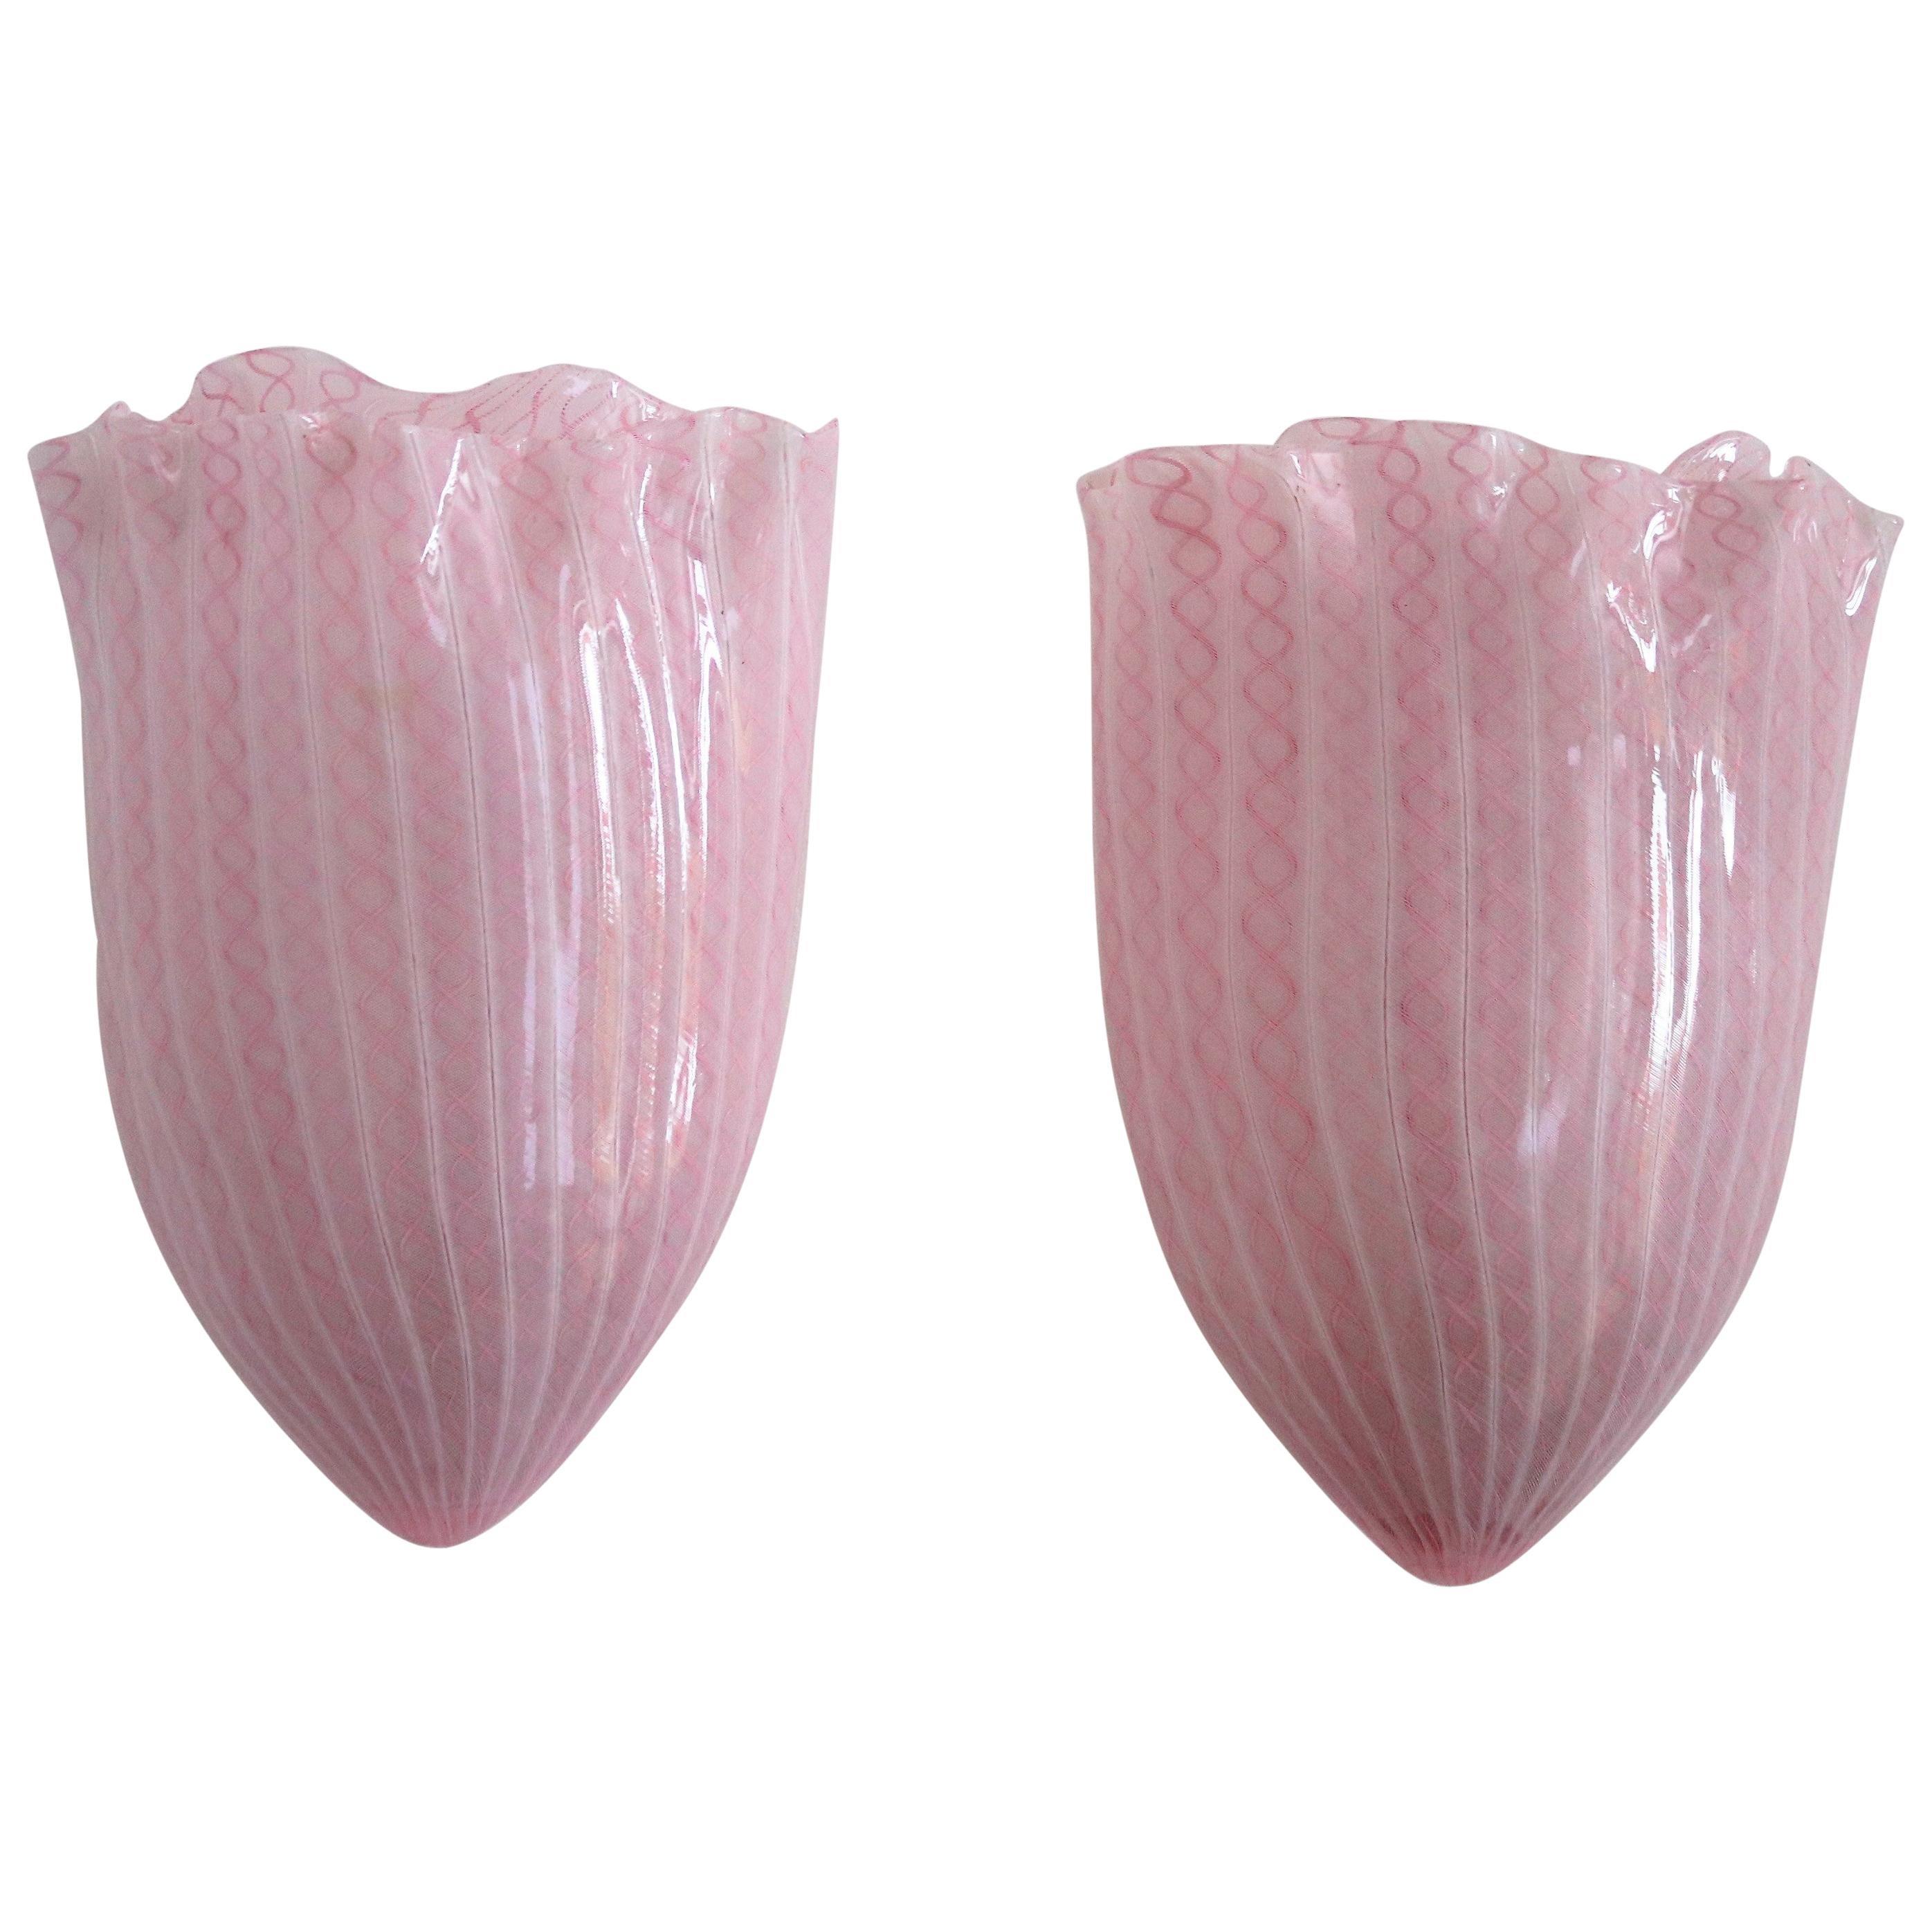 Fulvio Bianconi Venini Italian Midcentury Wall Sconces in Pink Murano Glass